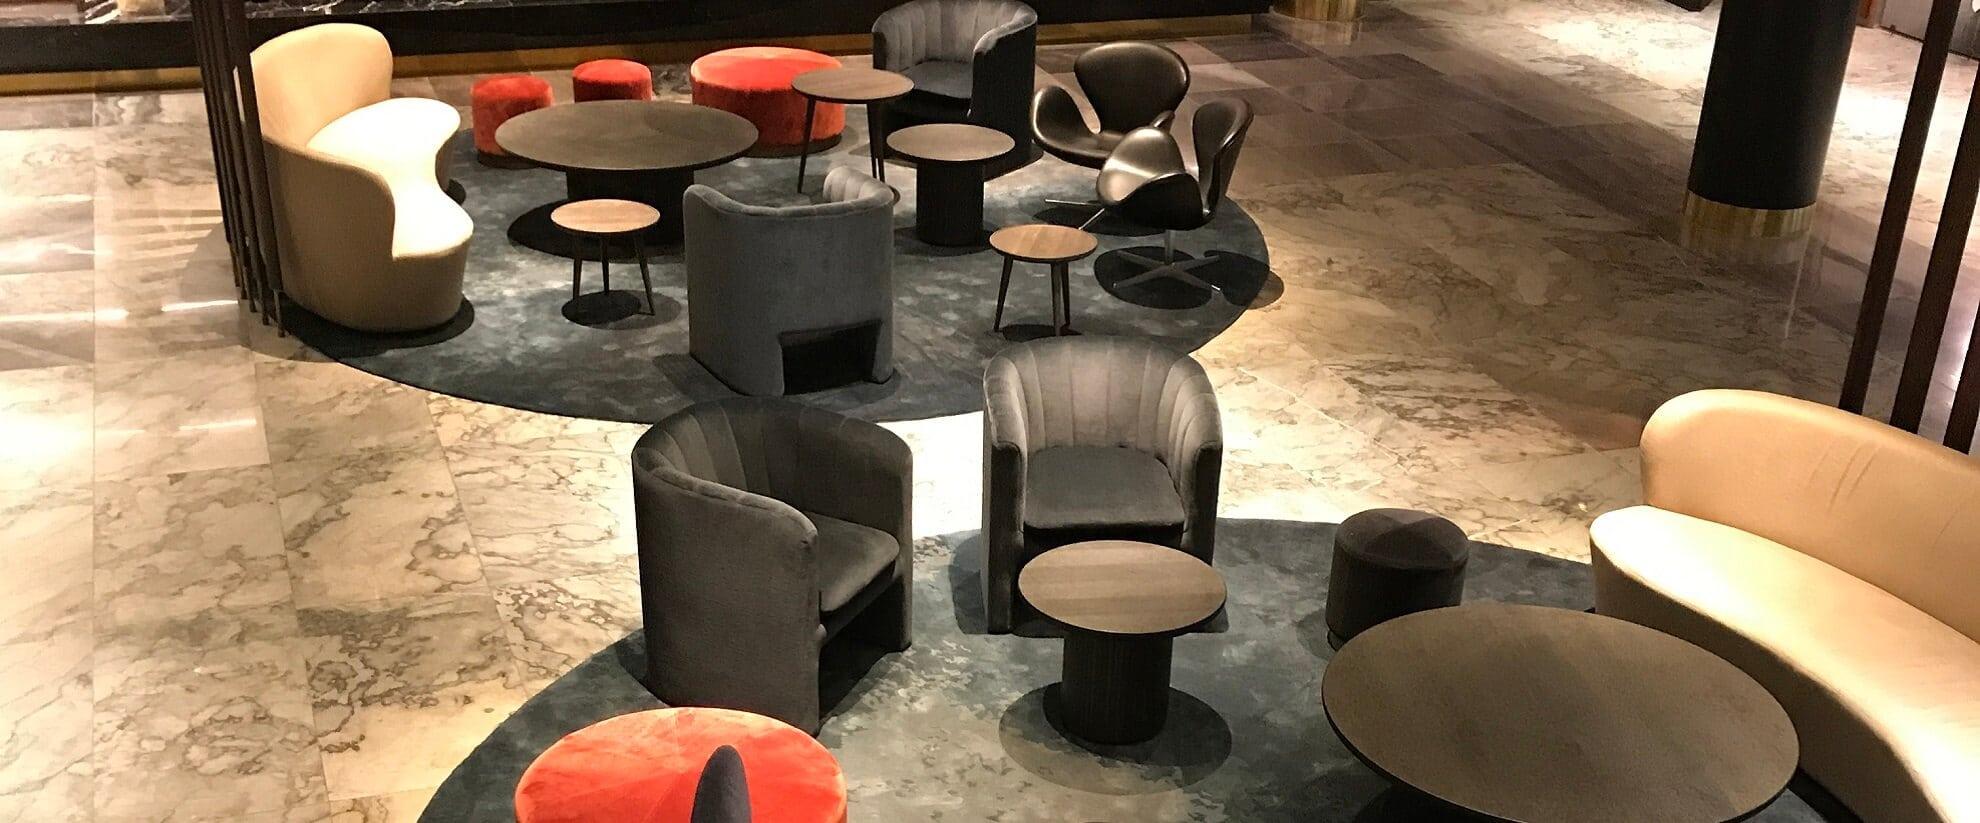 Royal Hotel in Copenhagen with Dansk Wilton carpet solutios